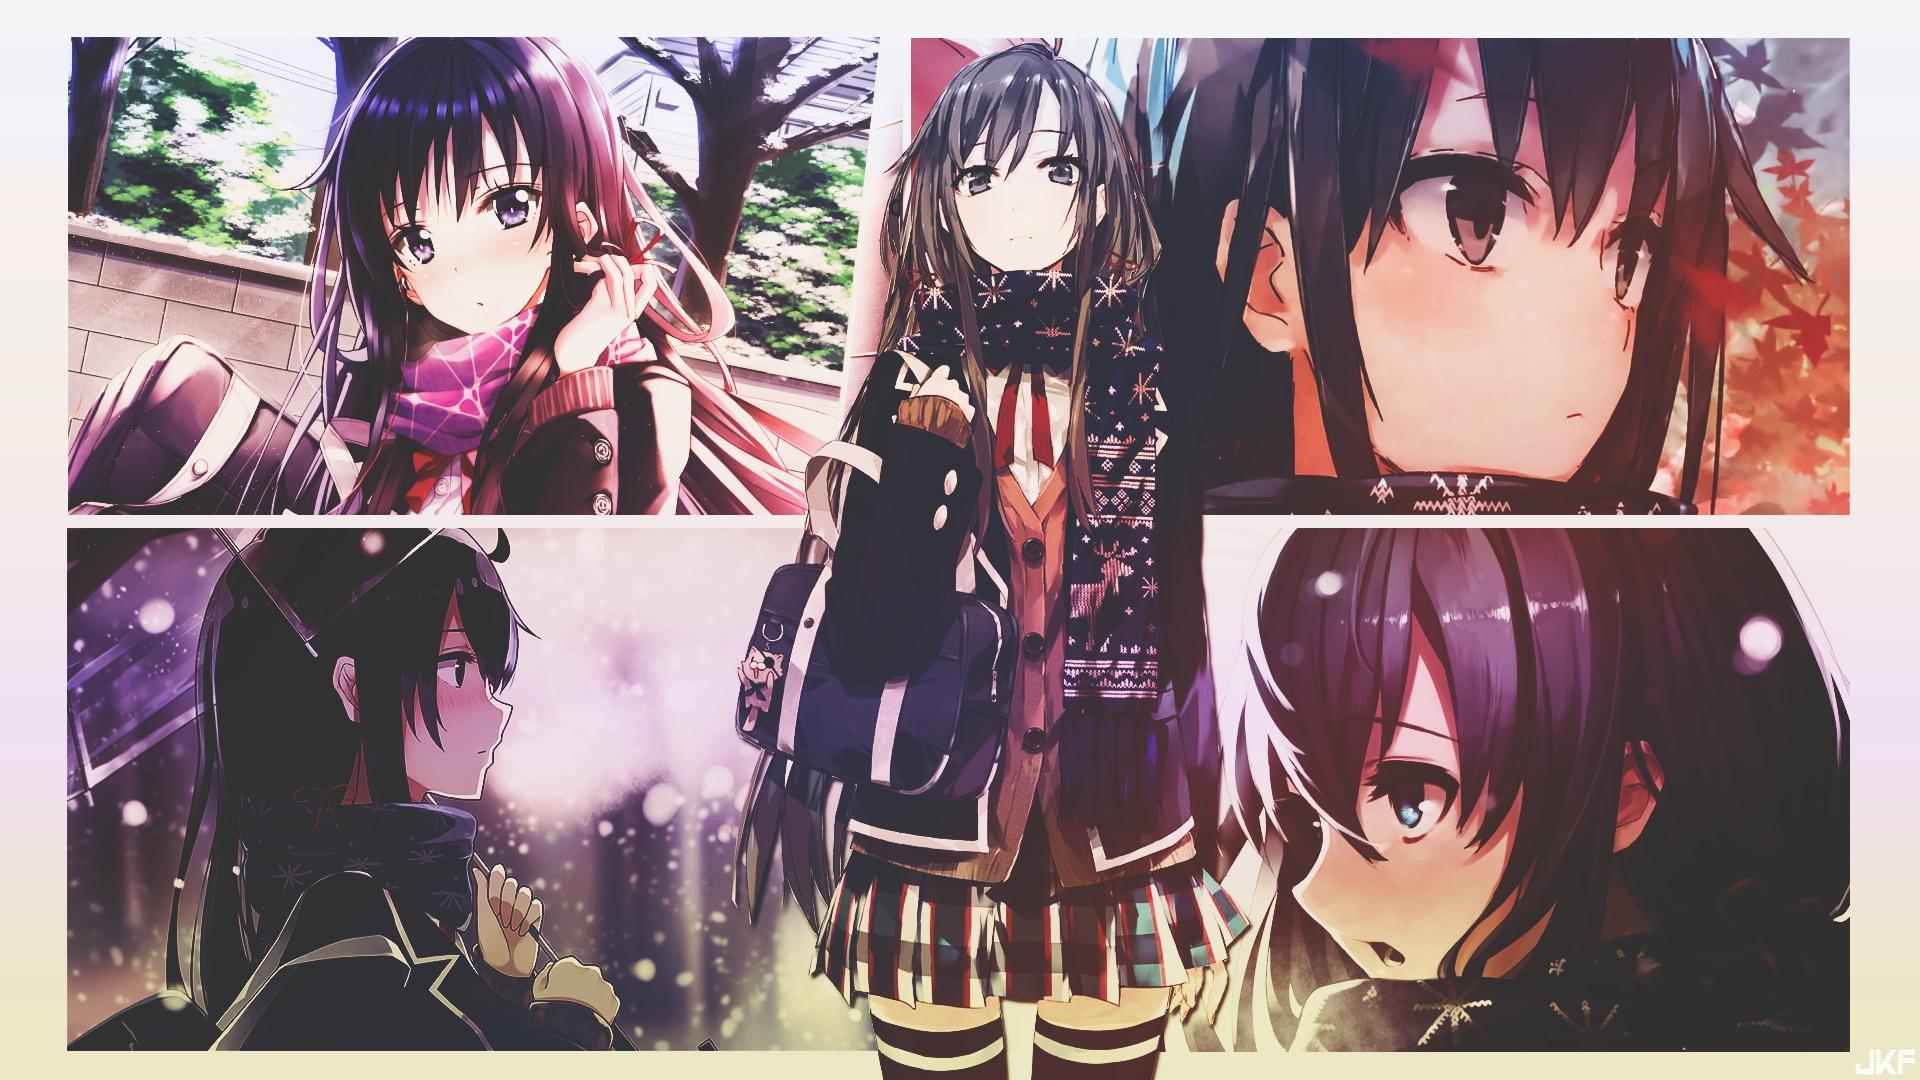 yukino_wallpaper_2_by_dinocojv-d8t3ohc.jpg